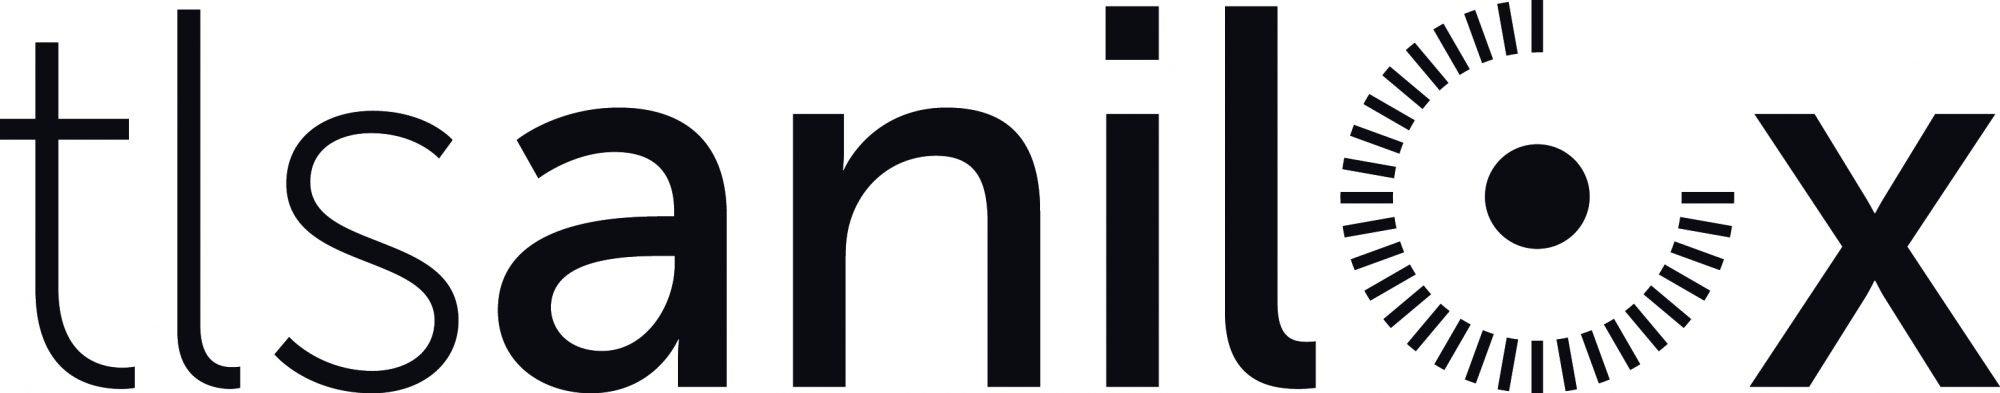 TLS-Logo-2000x393